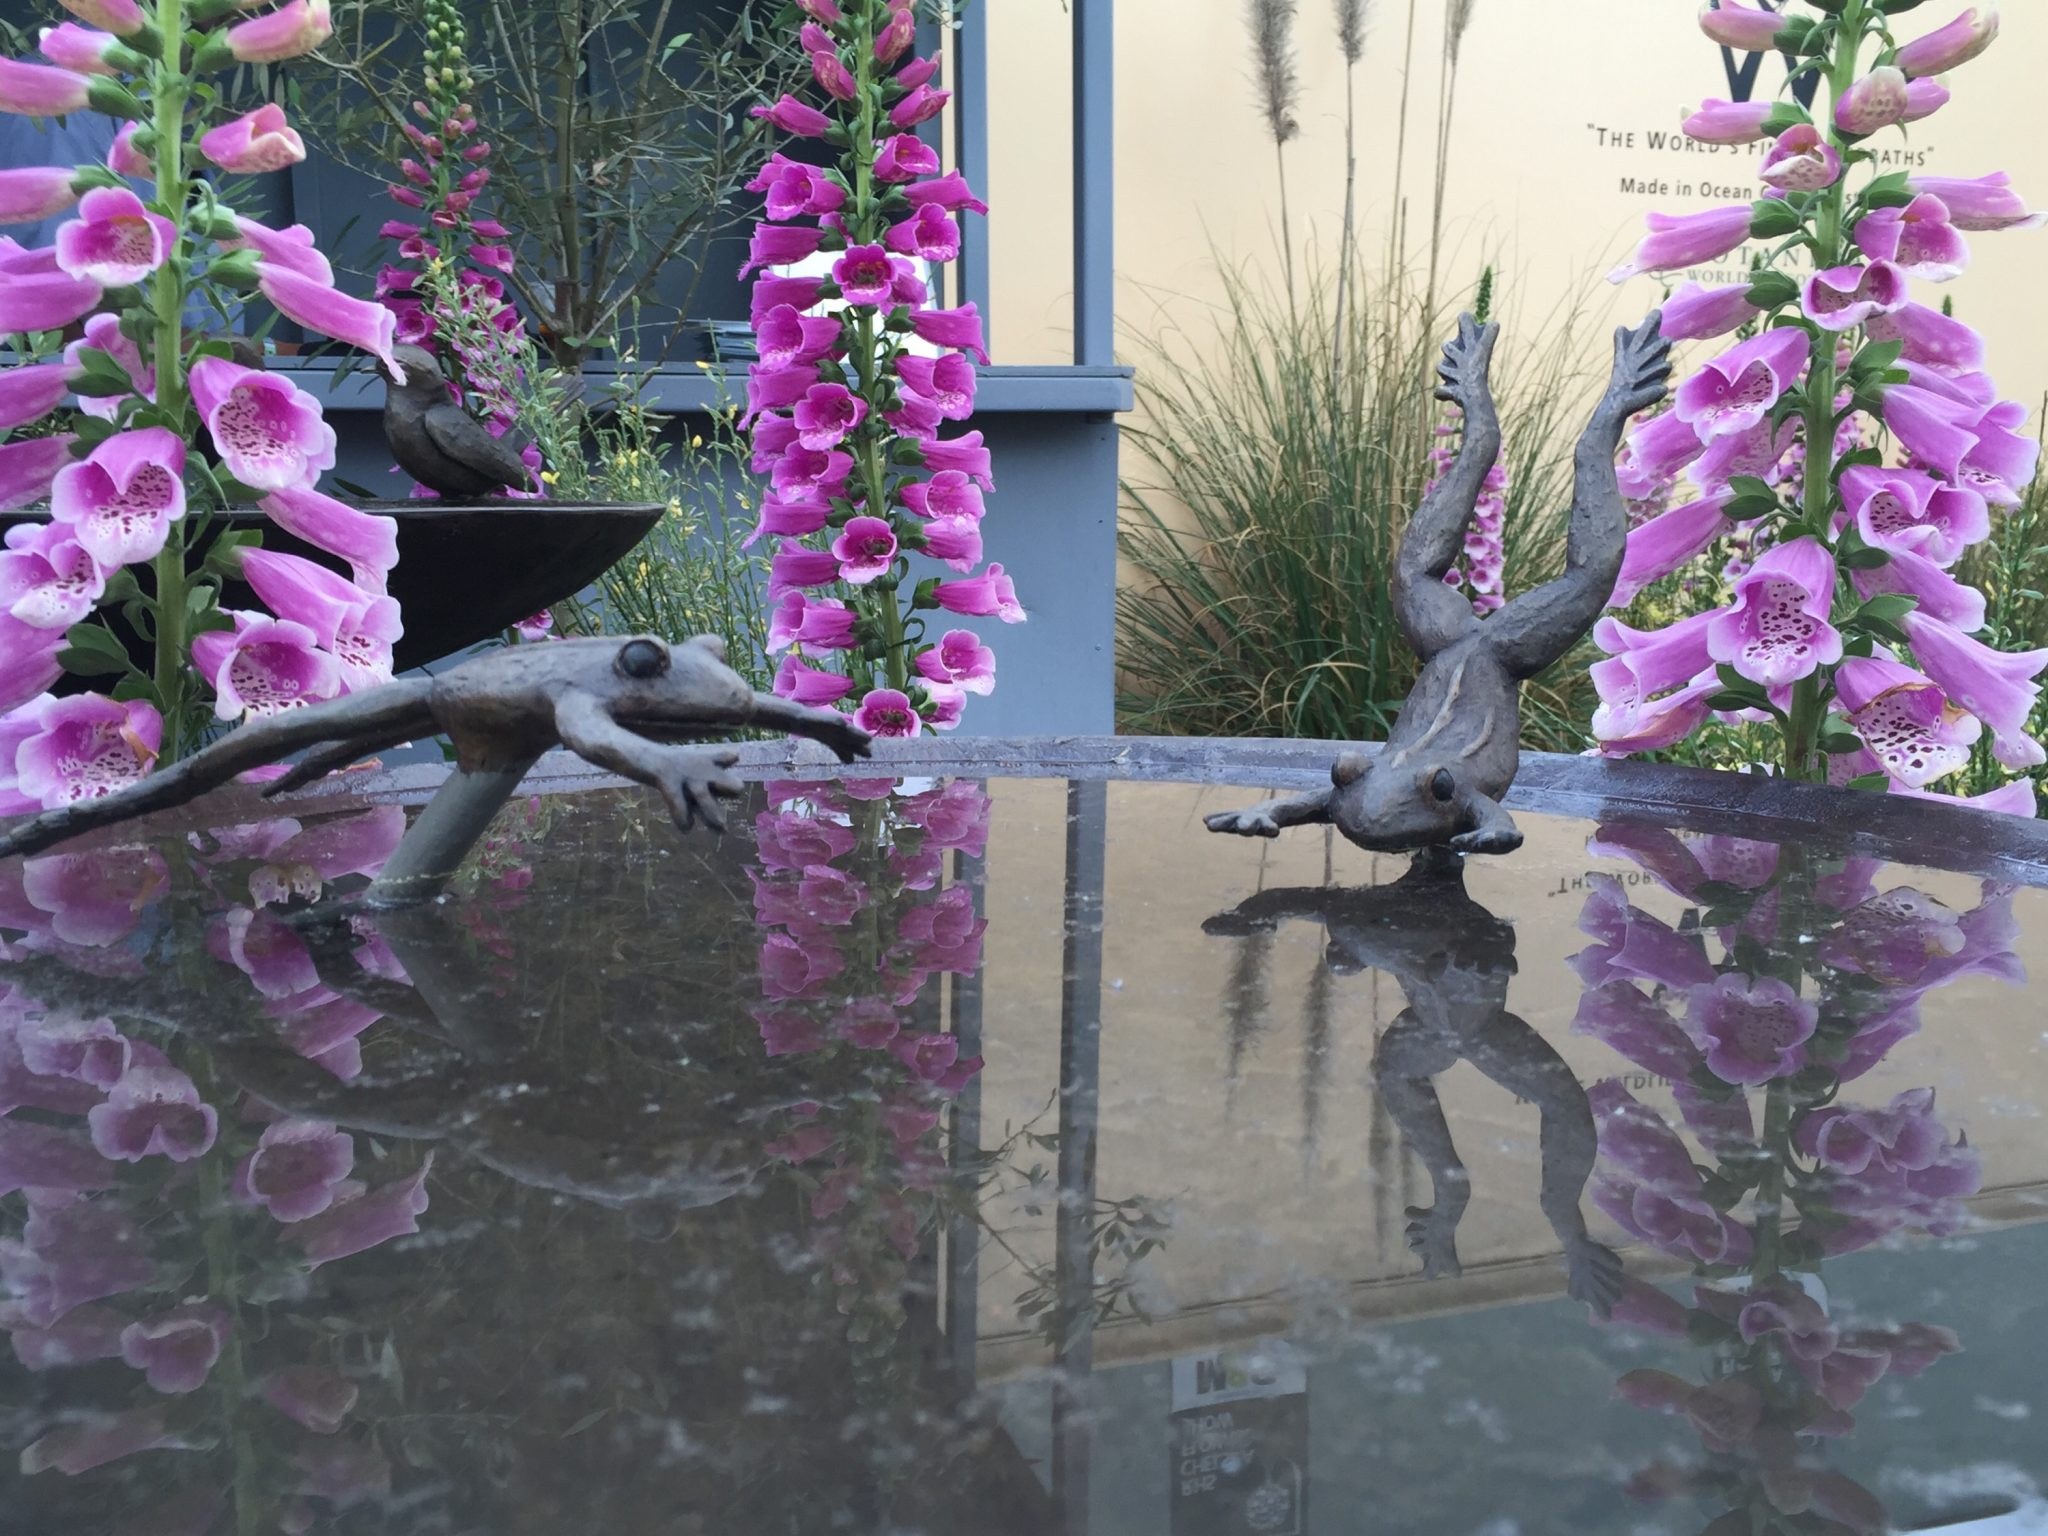 Frogs leaping into Birdbath Sculpture Chelsea Flower Show